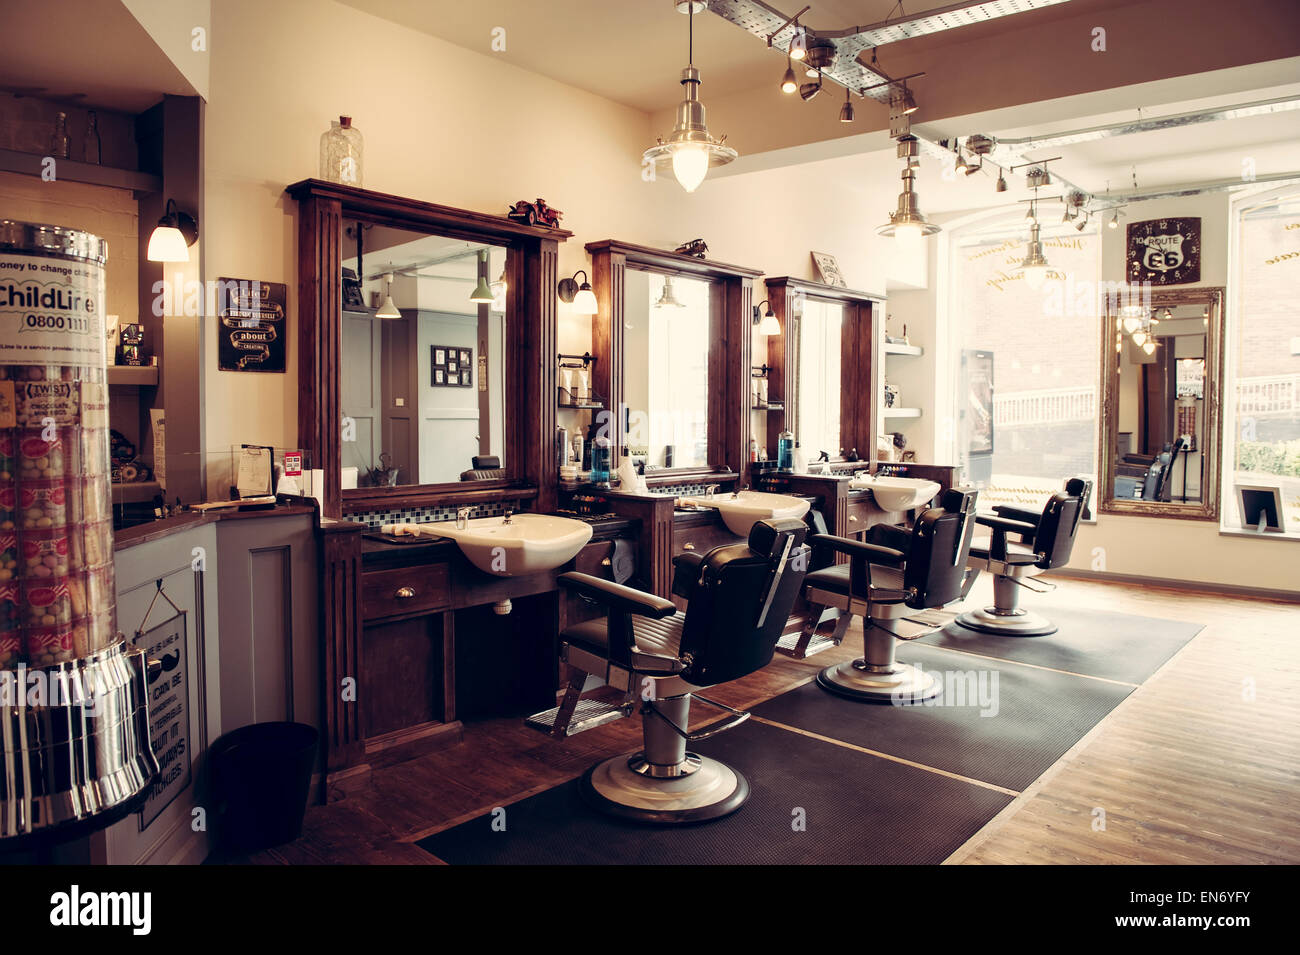 men 39 s barber shop retro styled interior design stock photo 81902575 alamy. Black Bedroom Furniture Sets. Home Design Ideas